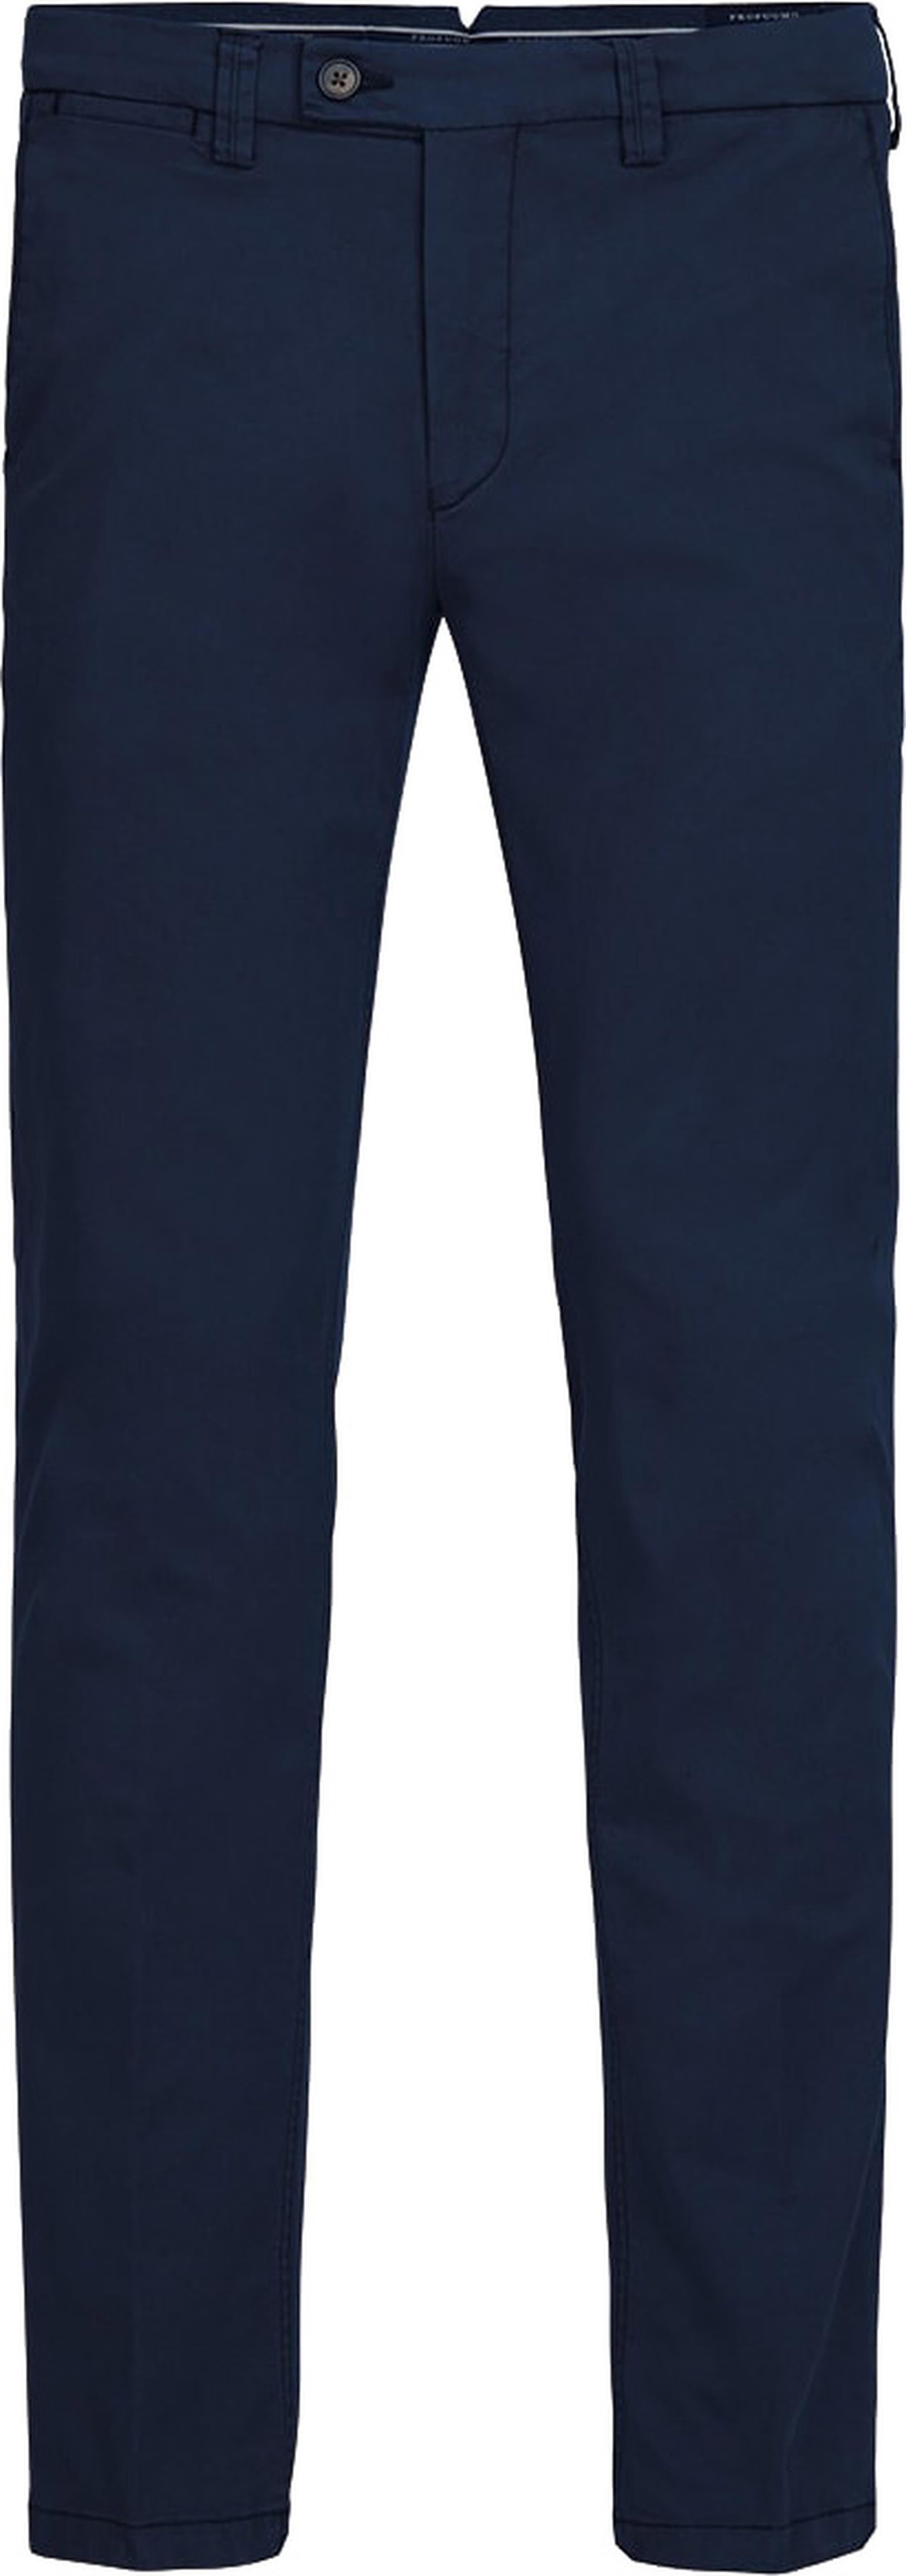 Profuomo Chino Garment DYE Navy